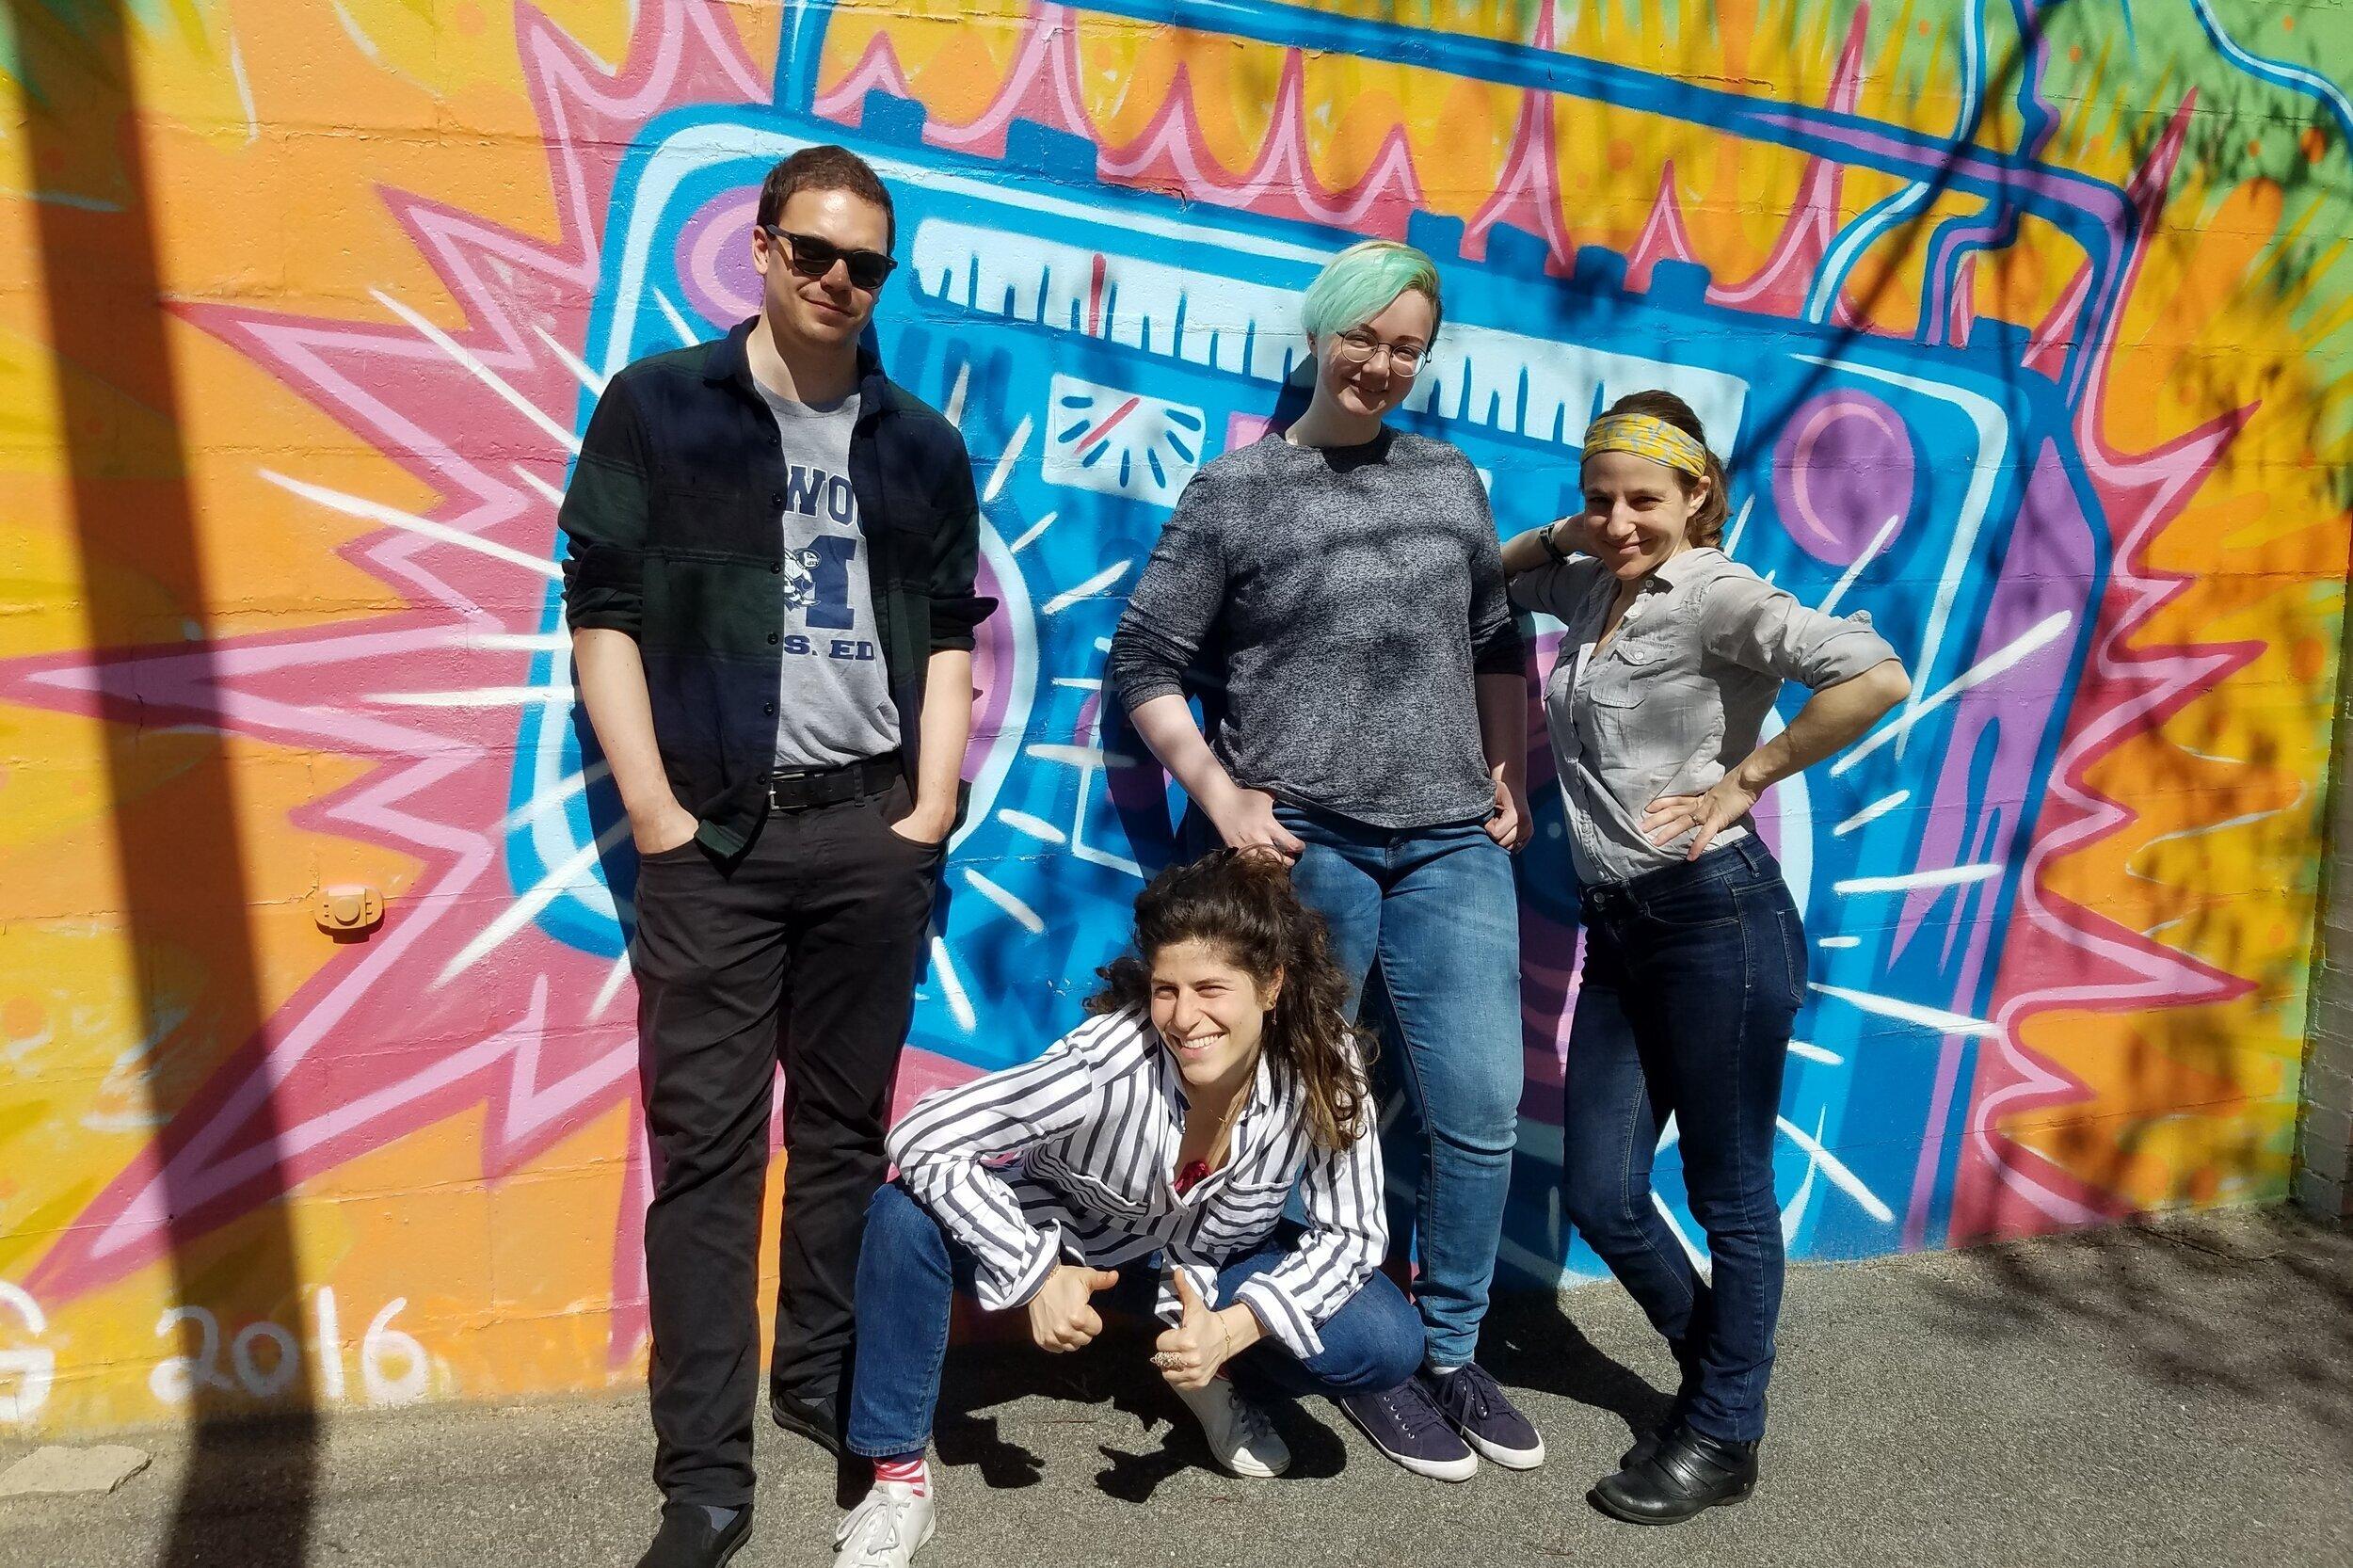 REVIVAL+Ensemble+graffiti+radio.jpg